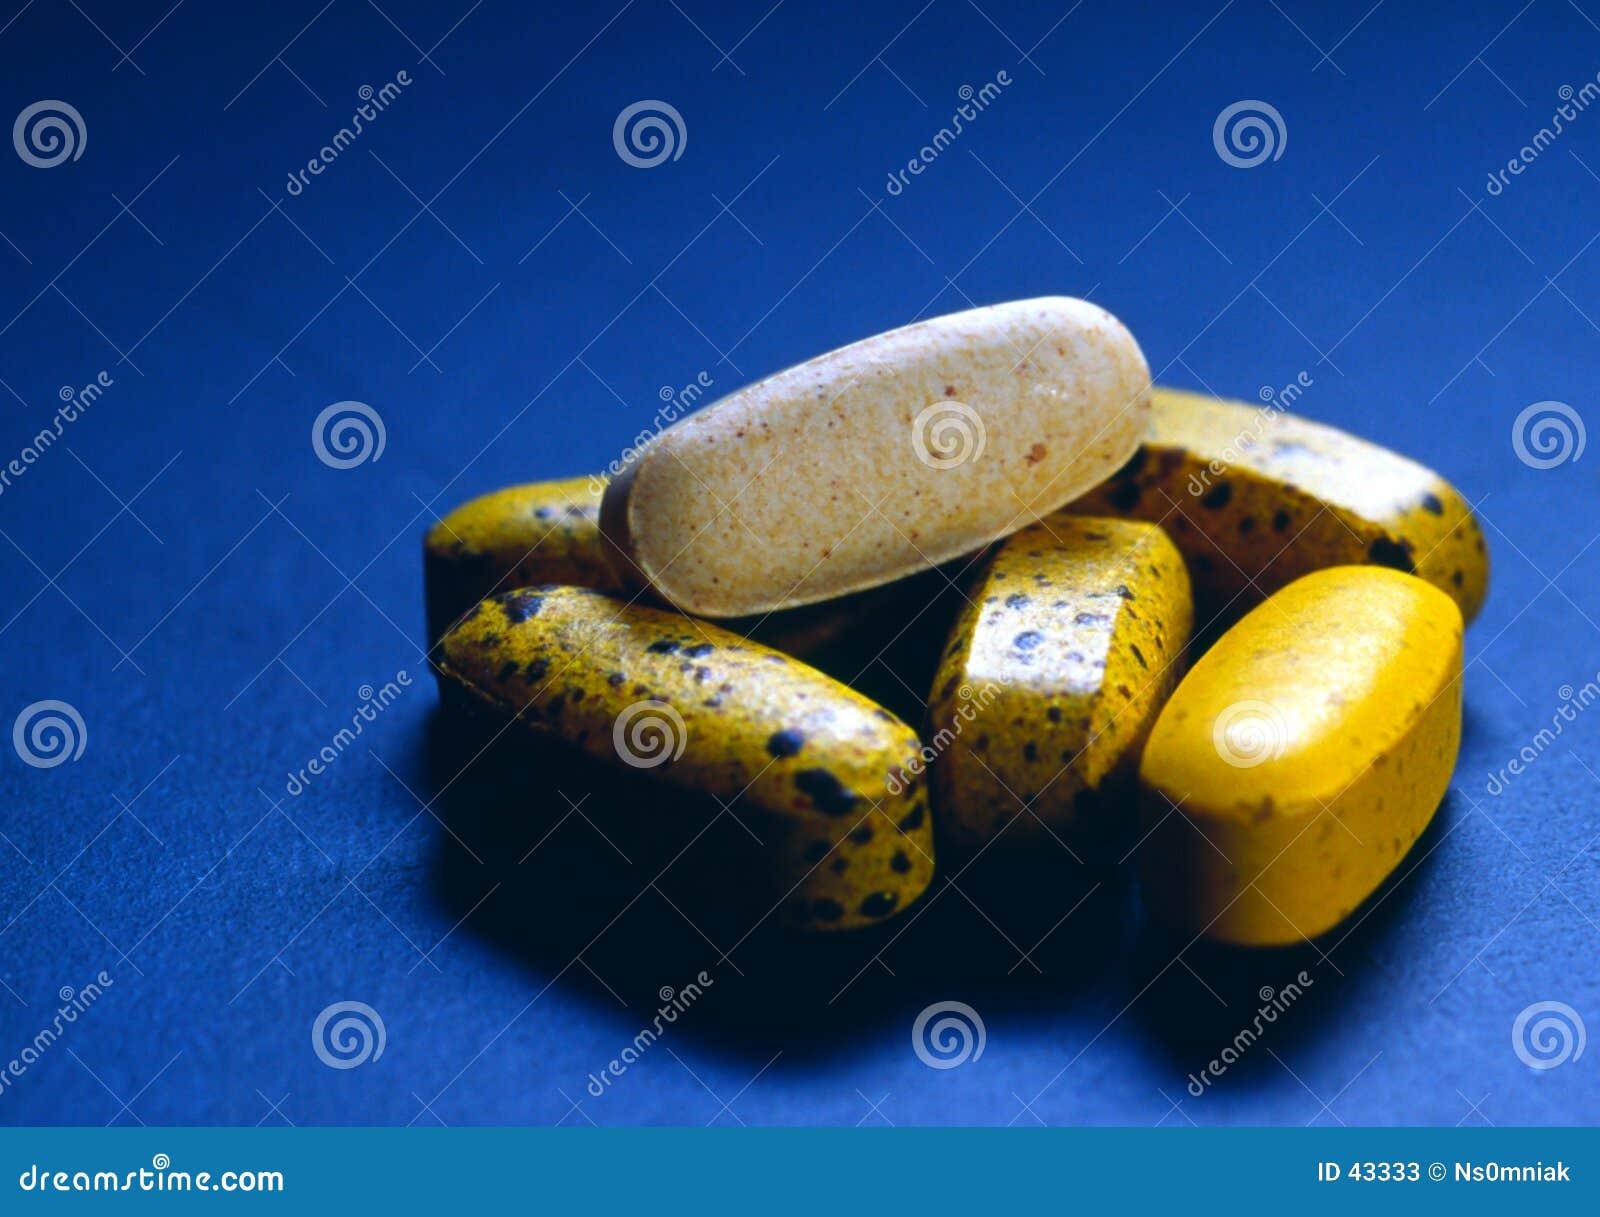 Take your vitamins